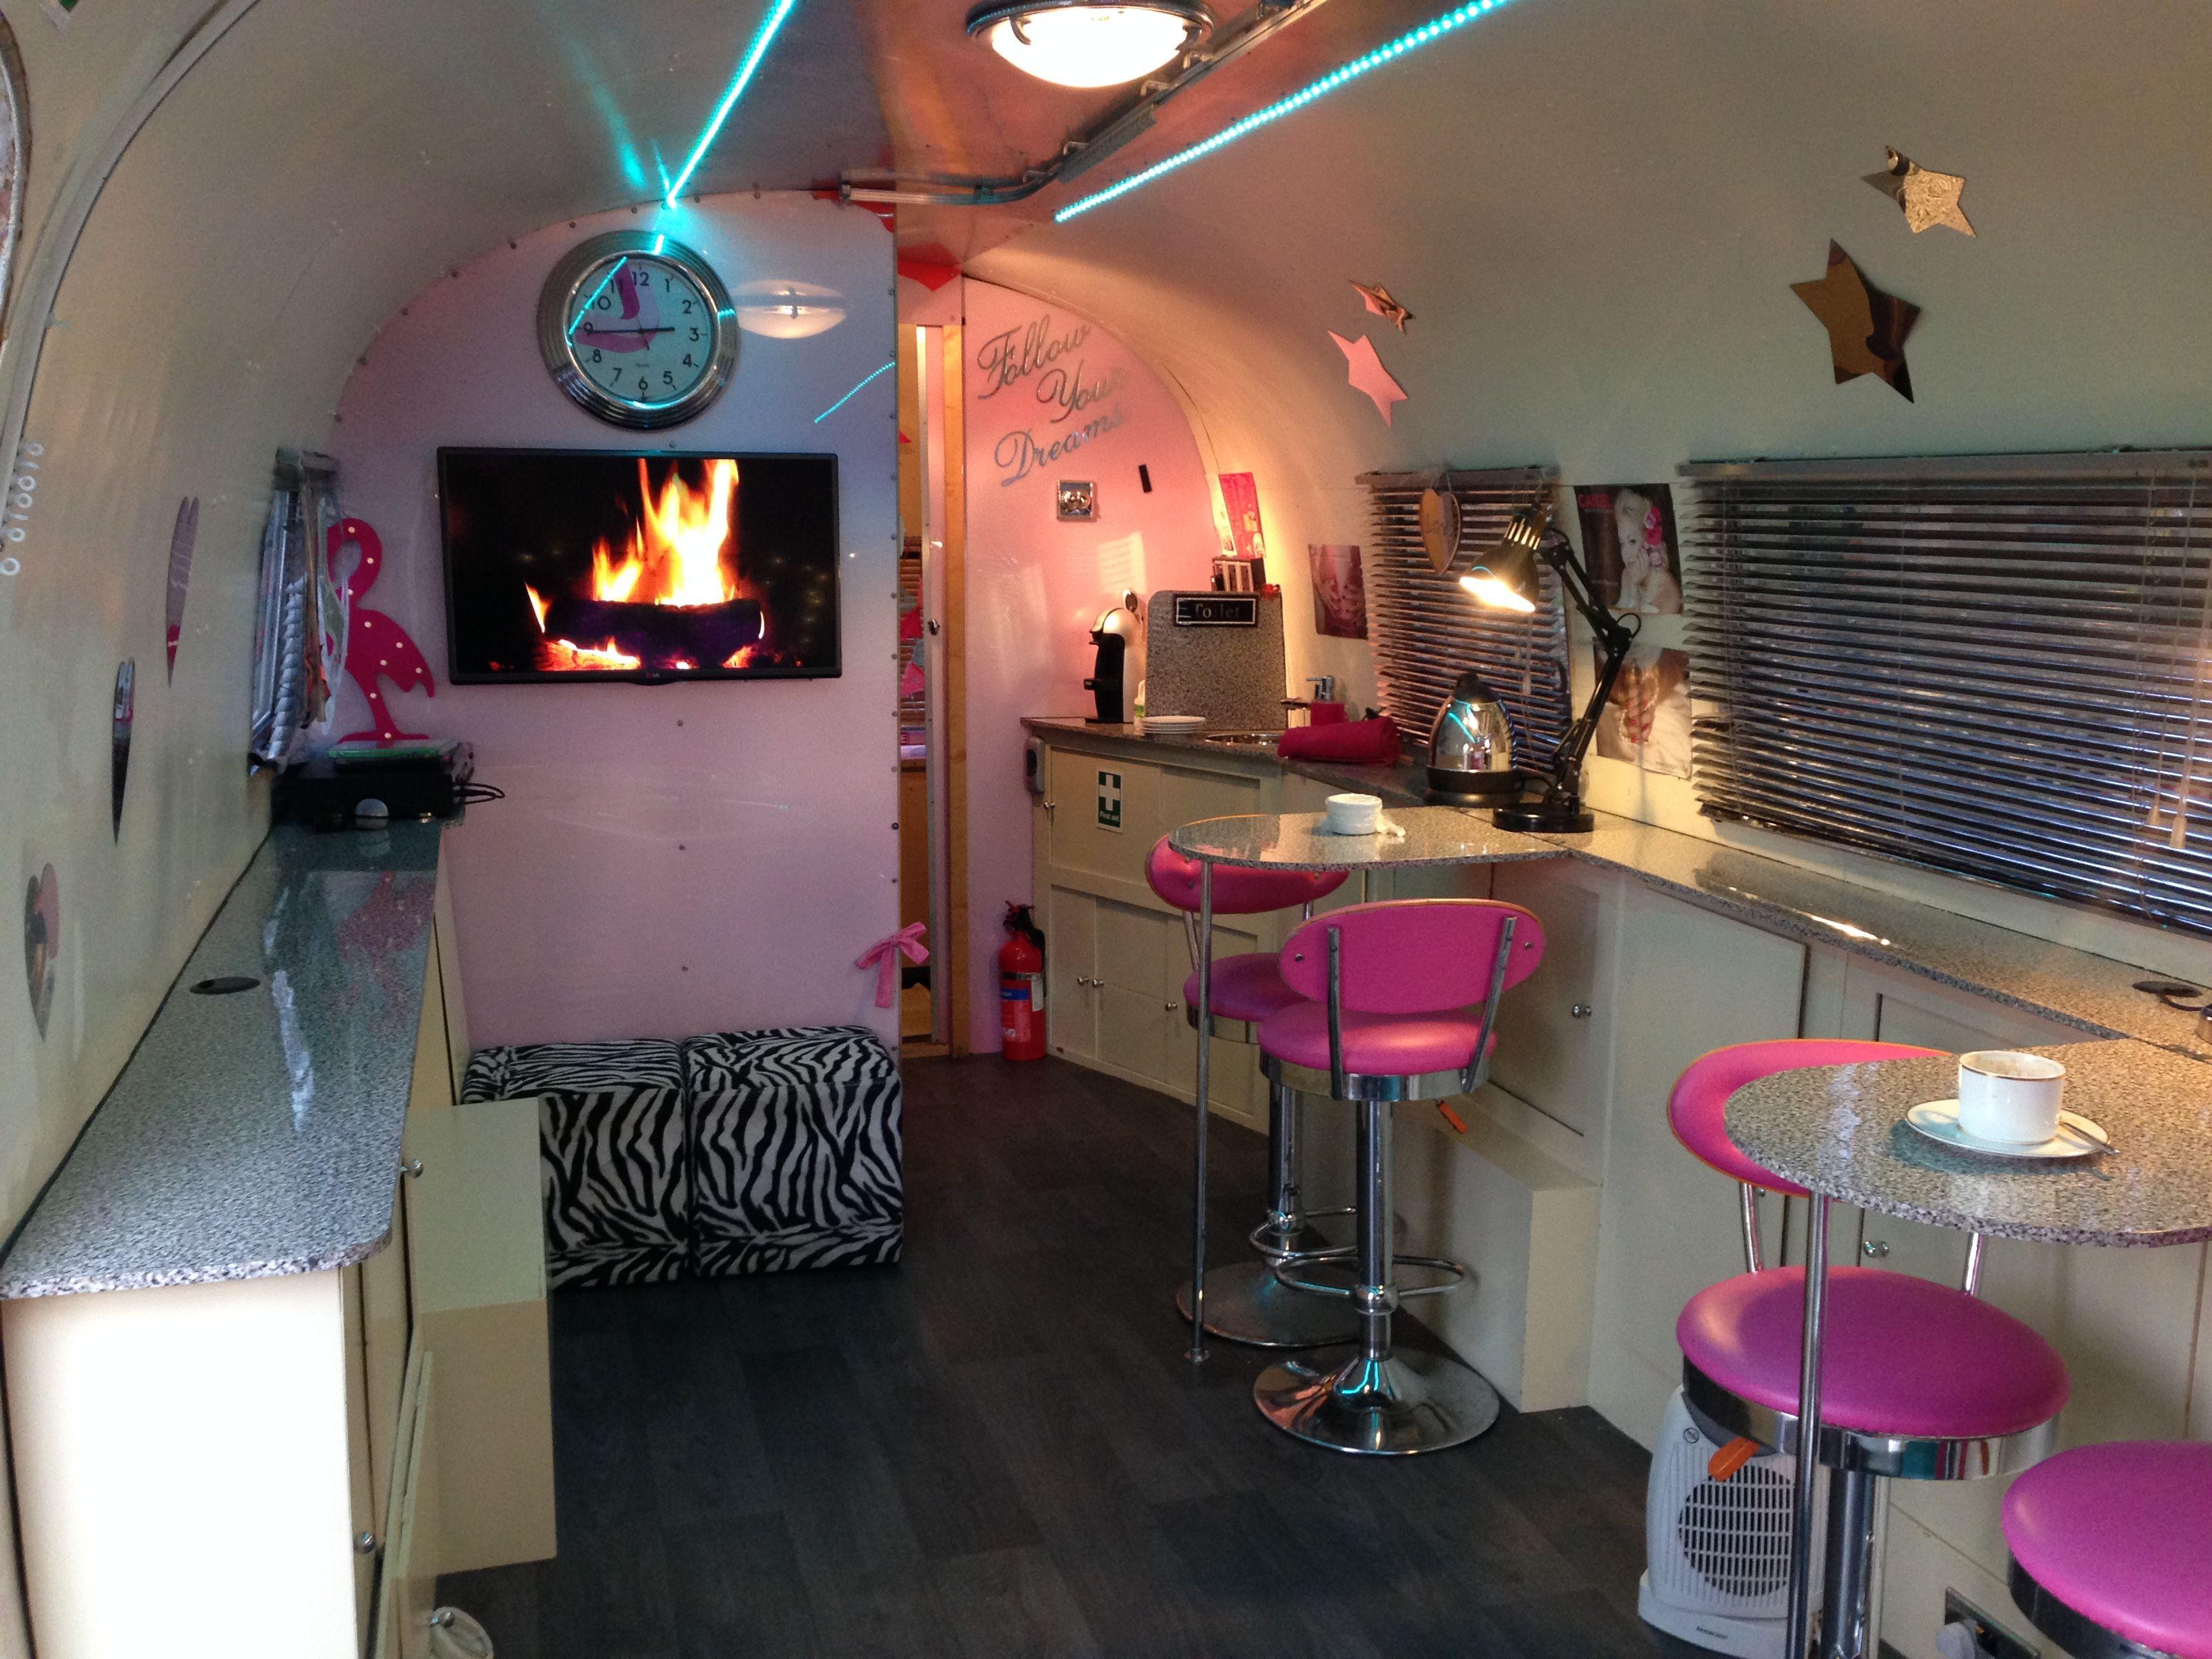 Mobile beauty salon. Pamper parties. Ladies pampering, hen